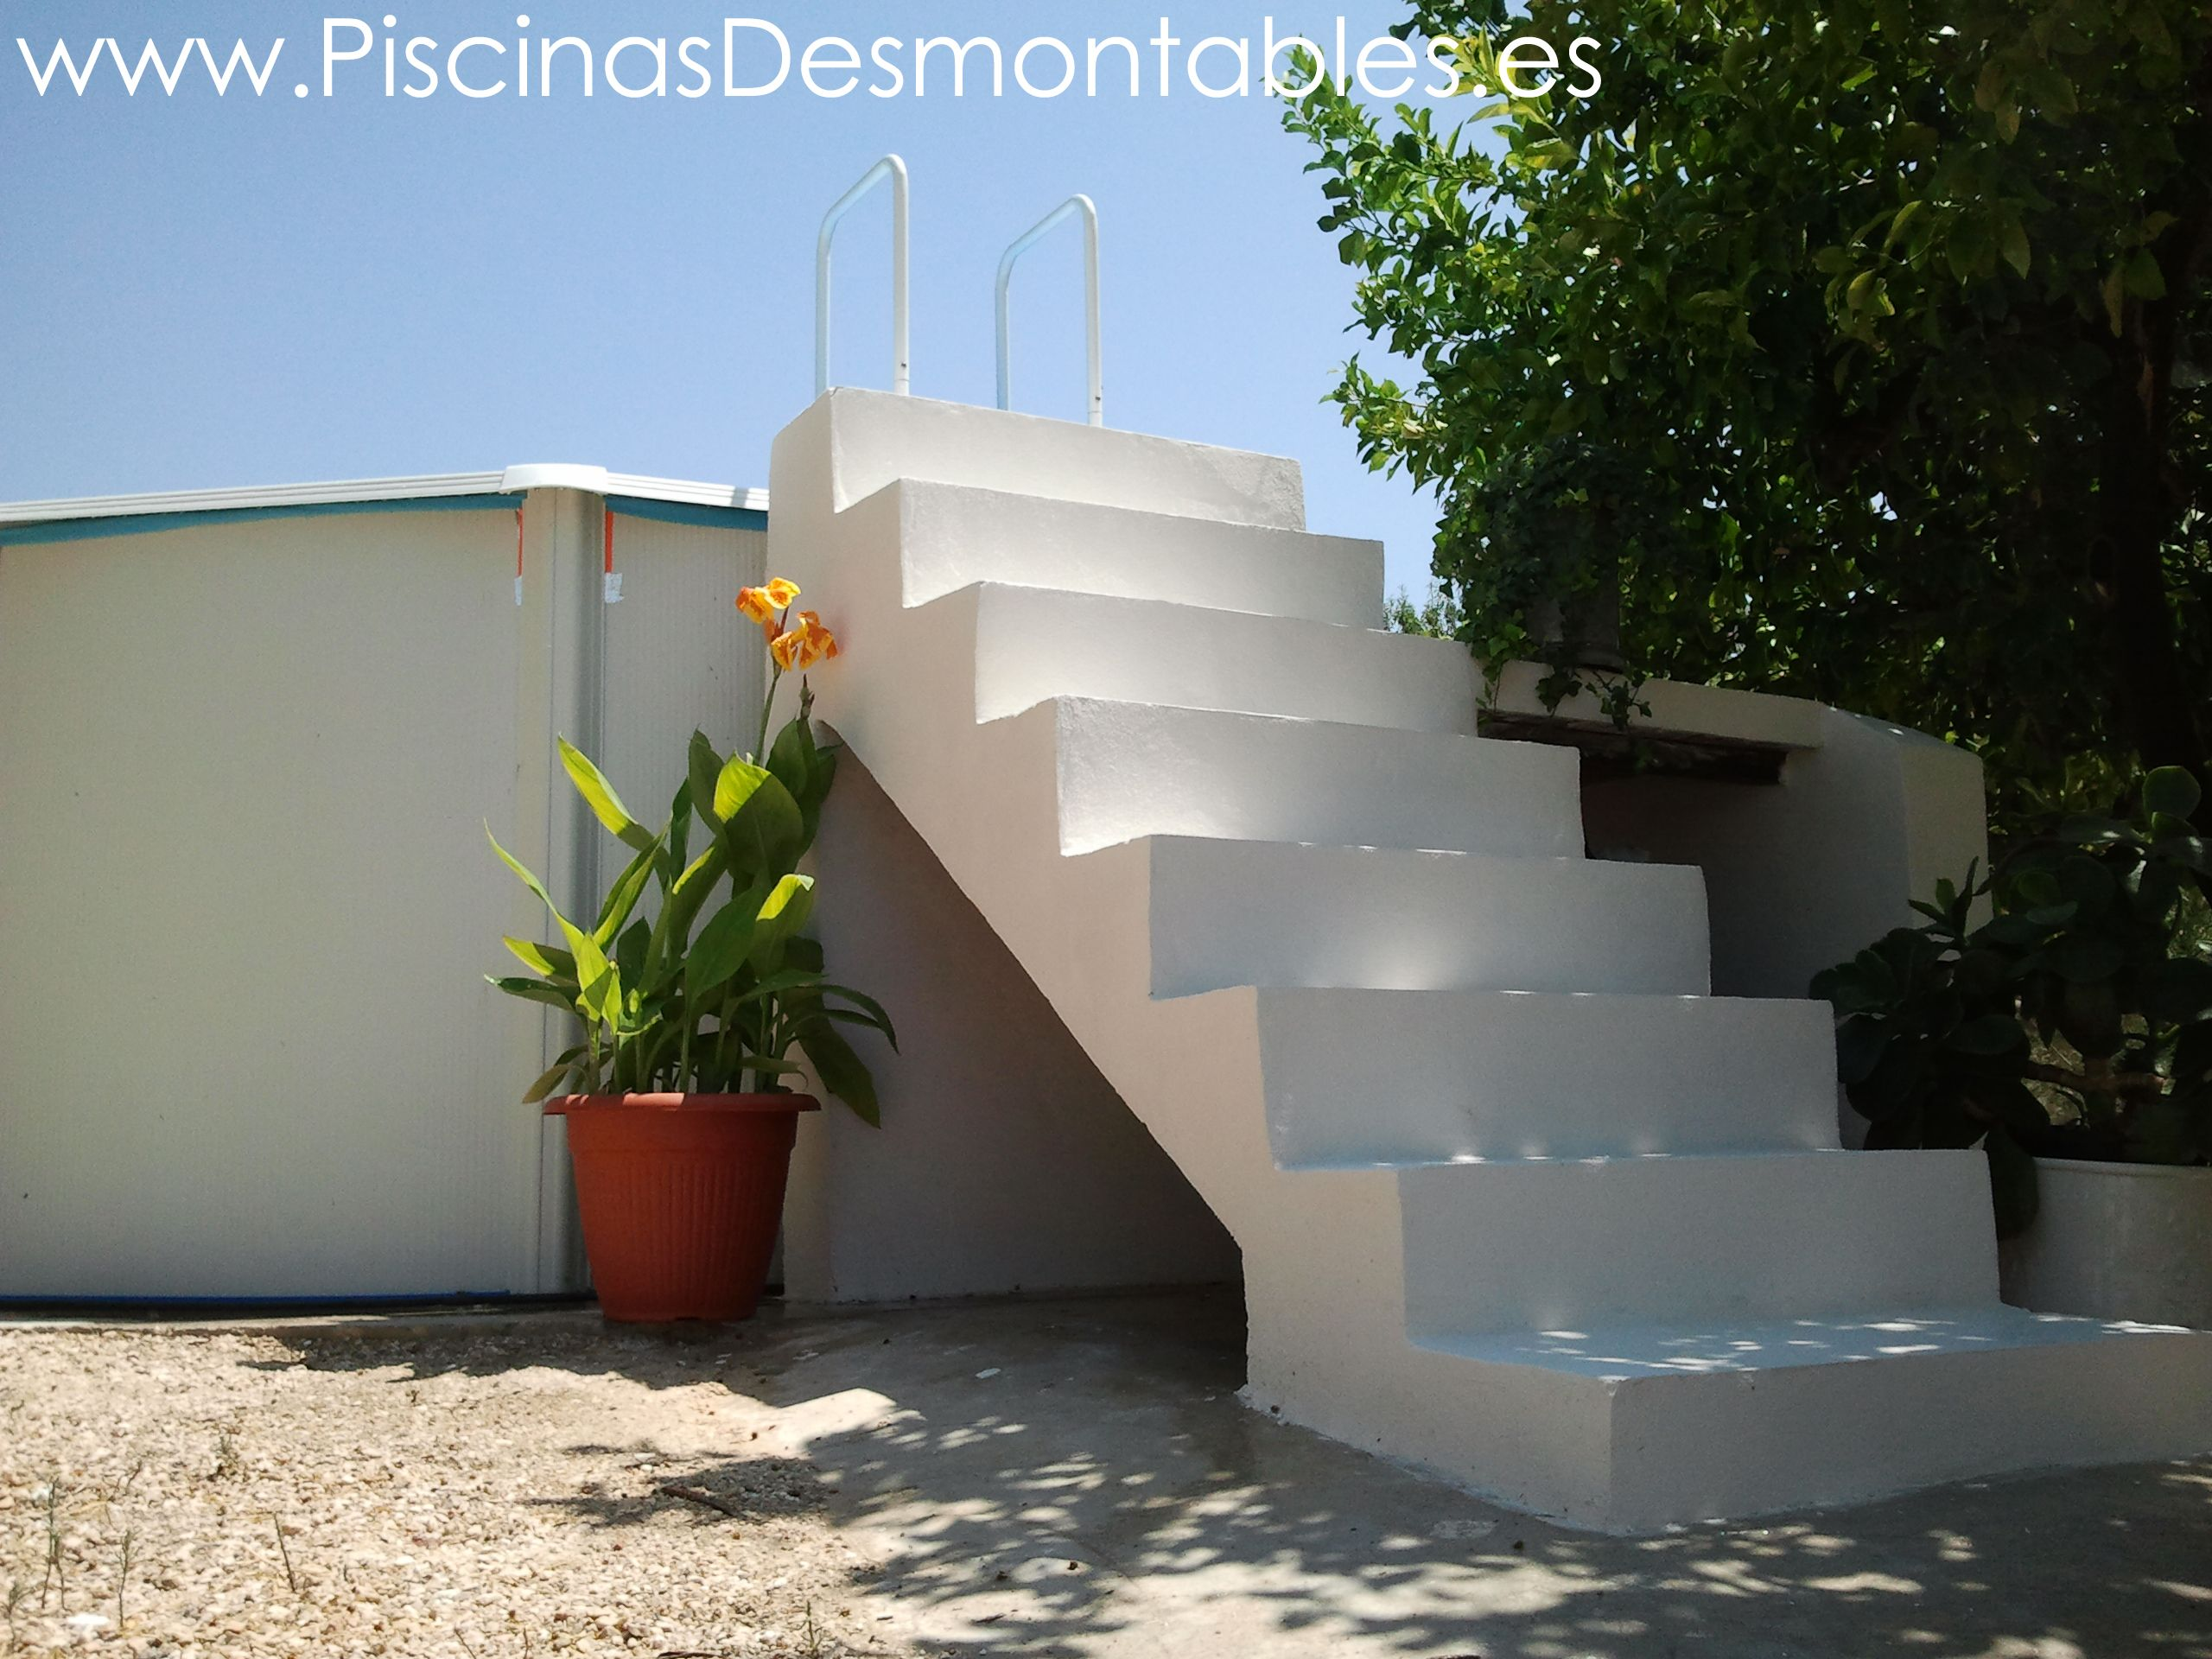 Escalera de cemento blanco para piscinas desmontables - Escalera piscina decathlon ...